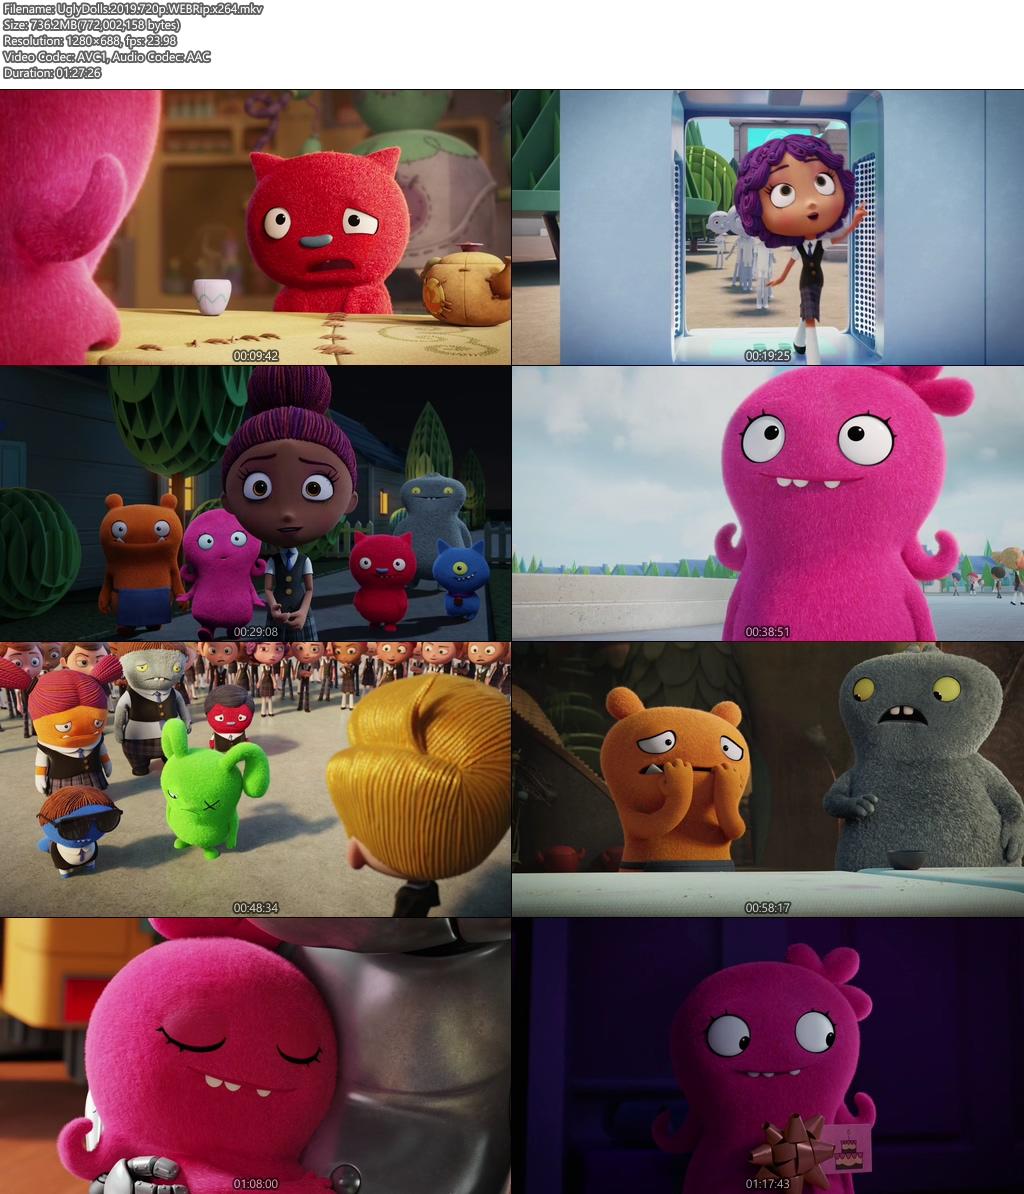 UglyDolls 2019 720p WEBRip x264 | 480p 300MB | 100MB HEVC Screenshot